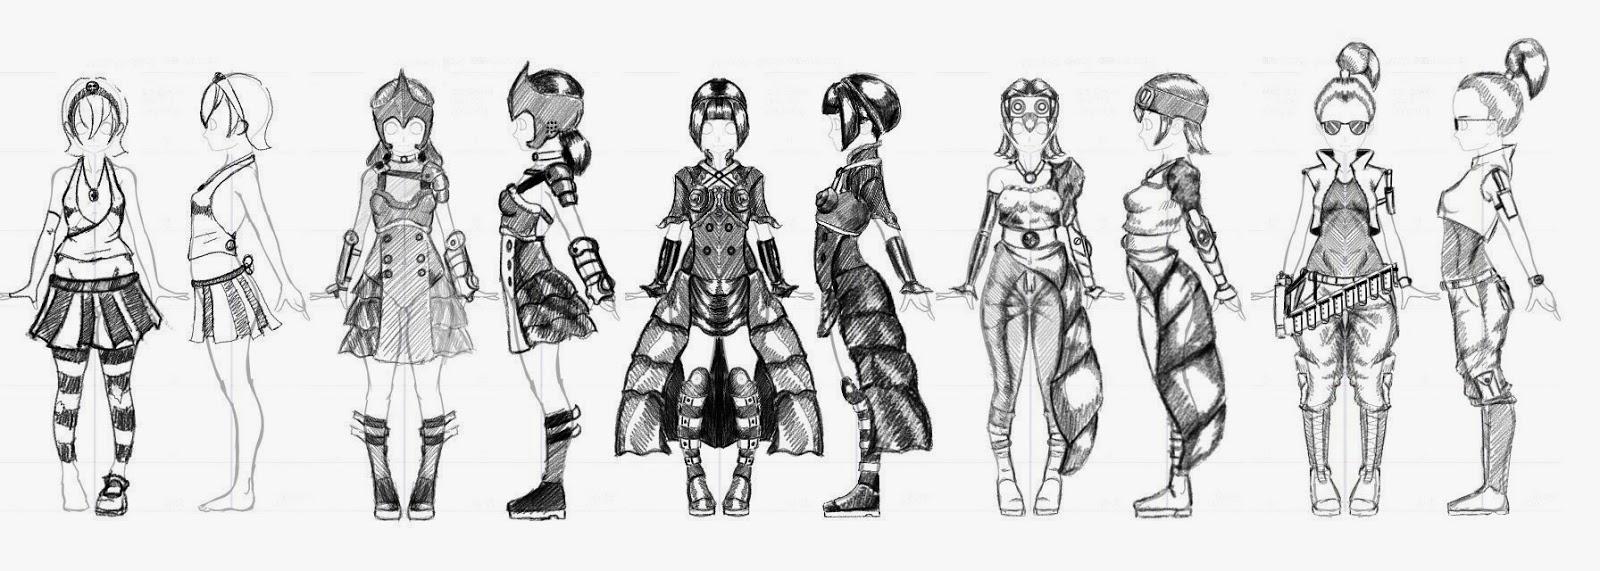 My Progress Portfolio Game Concept Art And Animation Costume